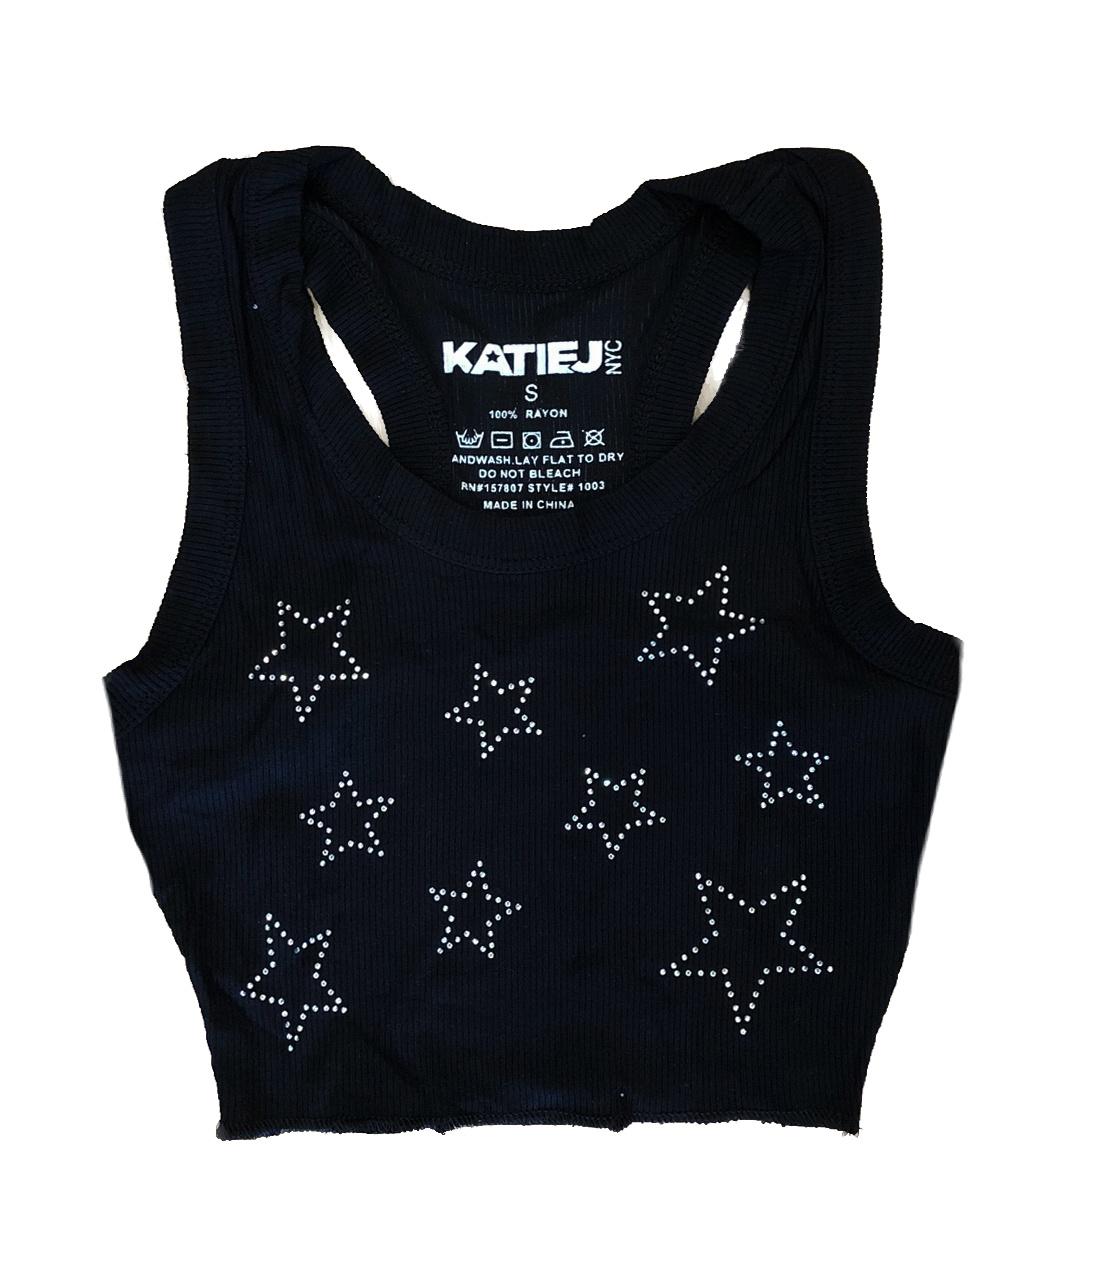 Katie J NYC Livi Black Star Crop Tank